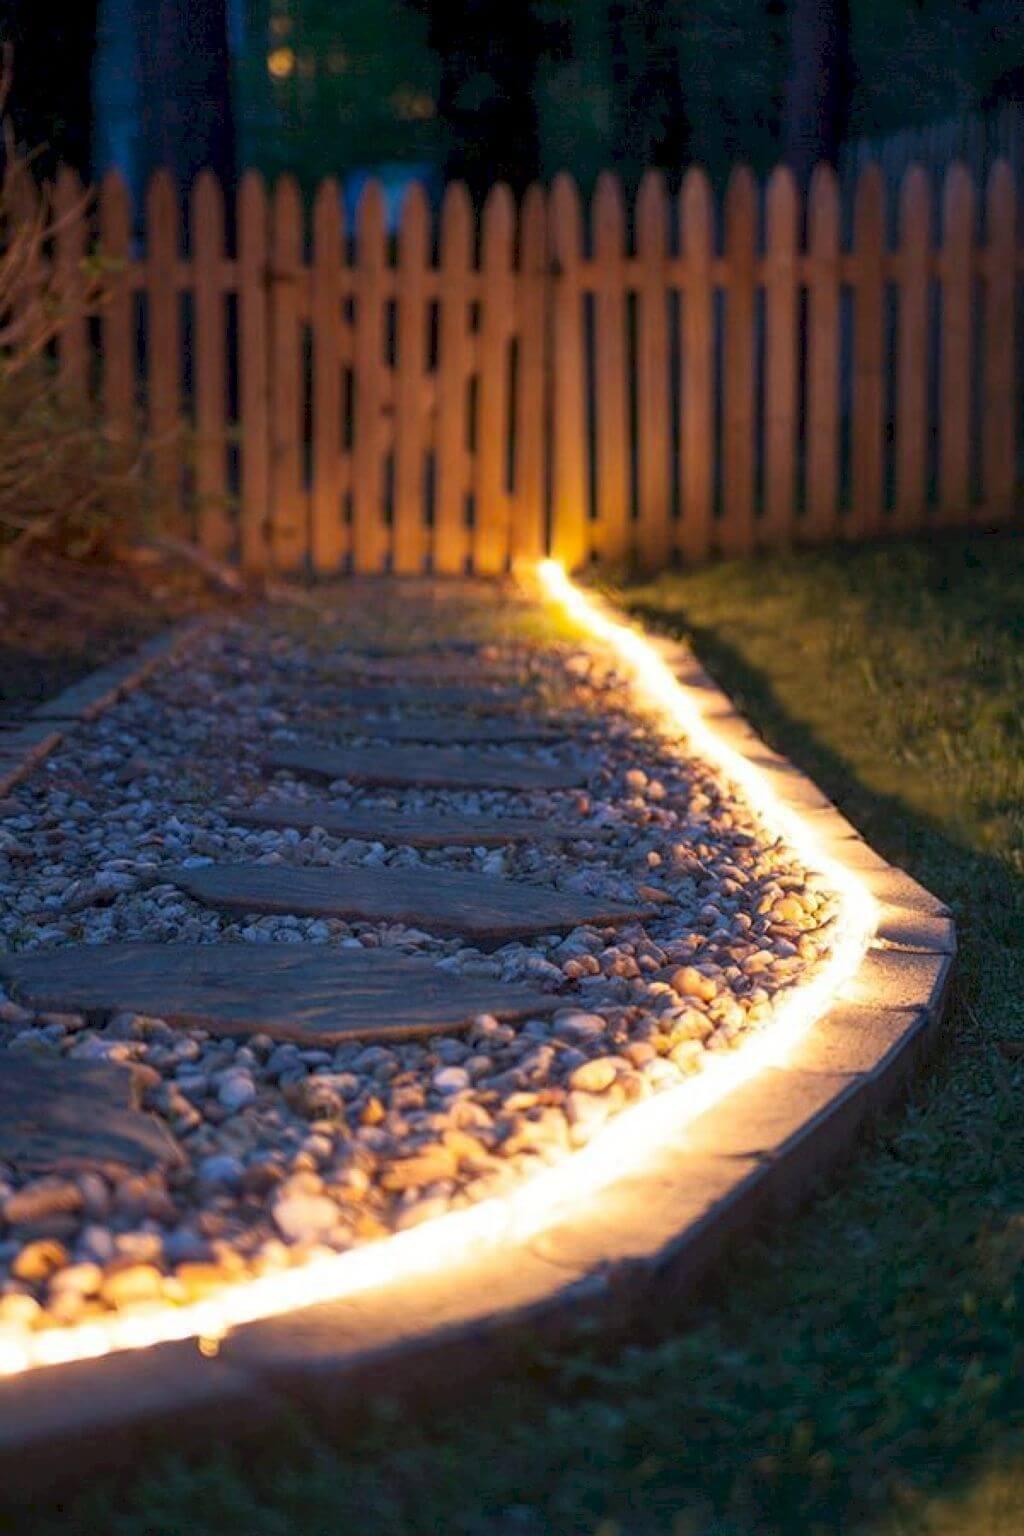 Bright Lights Shining from Brick Edging